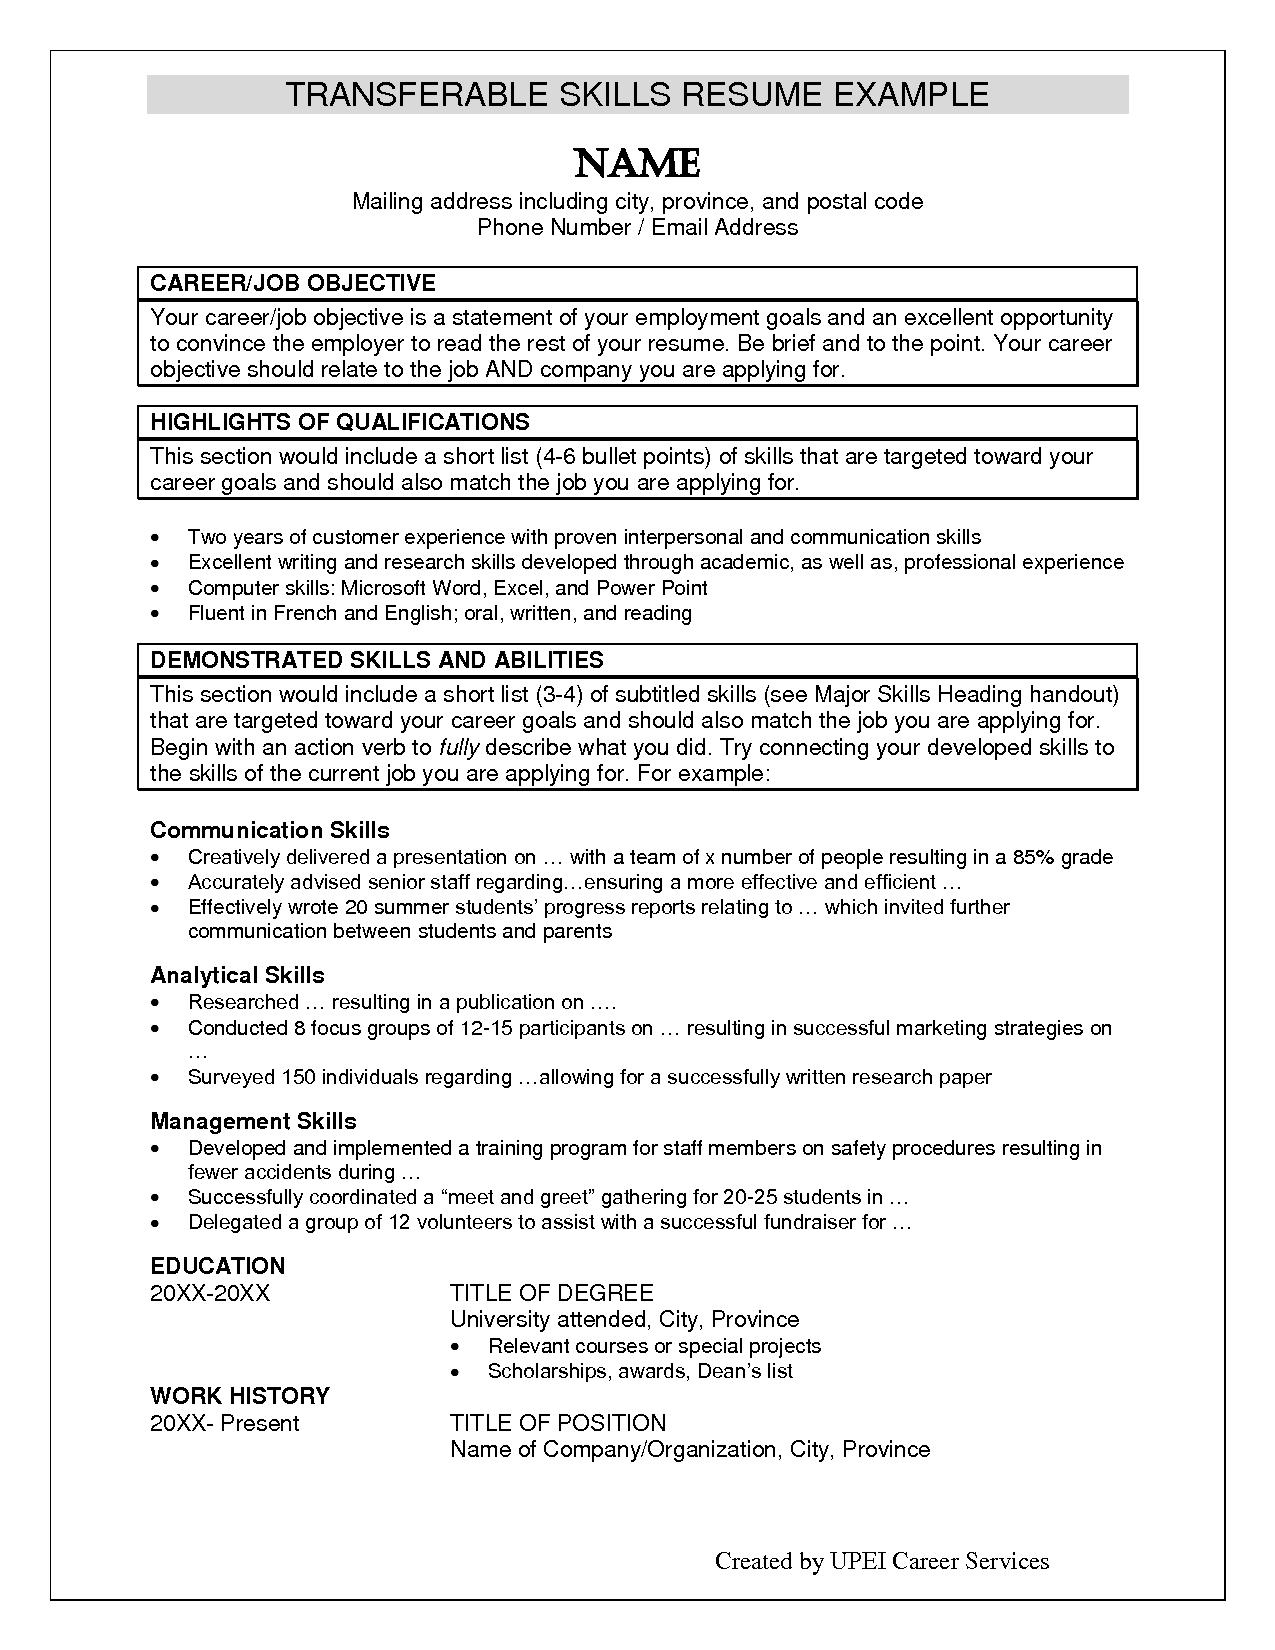 Resume Examples Skills